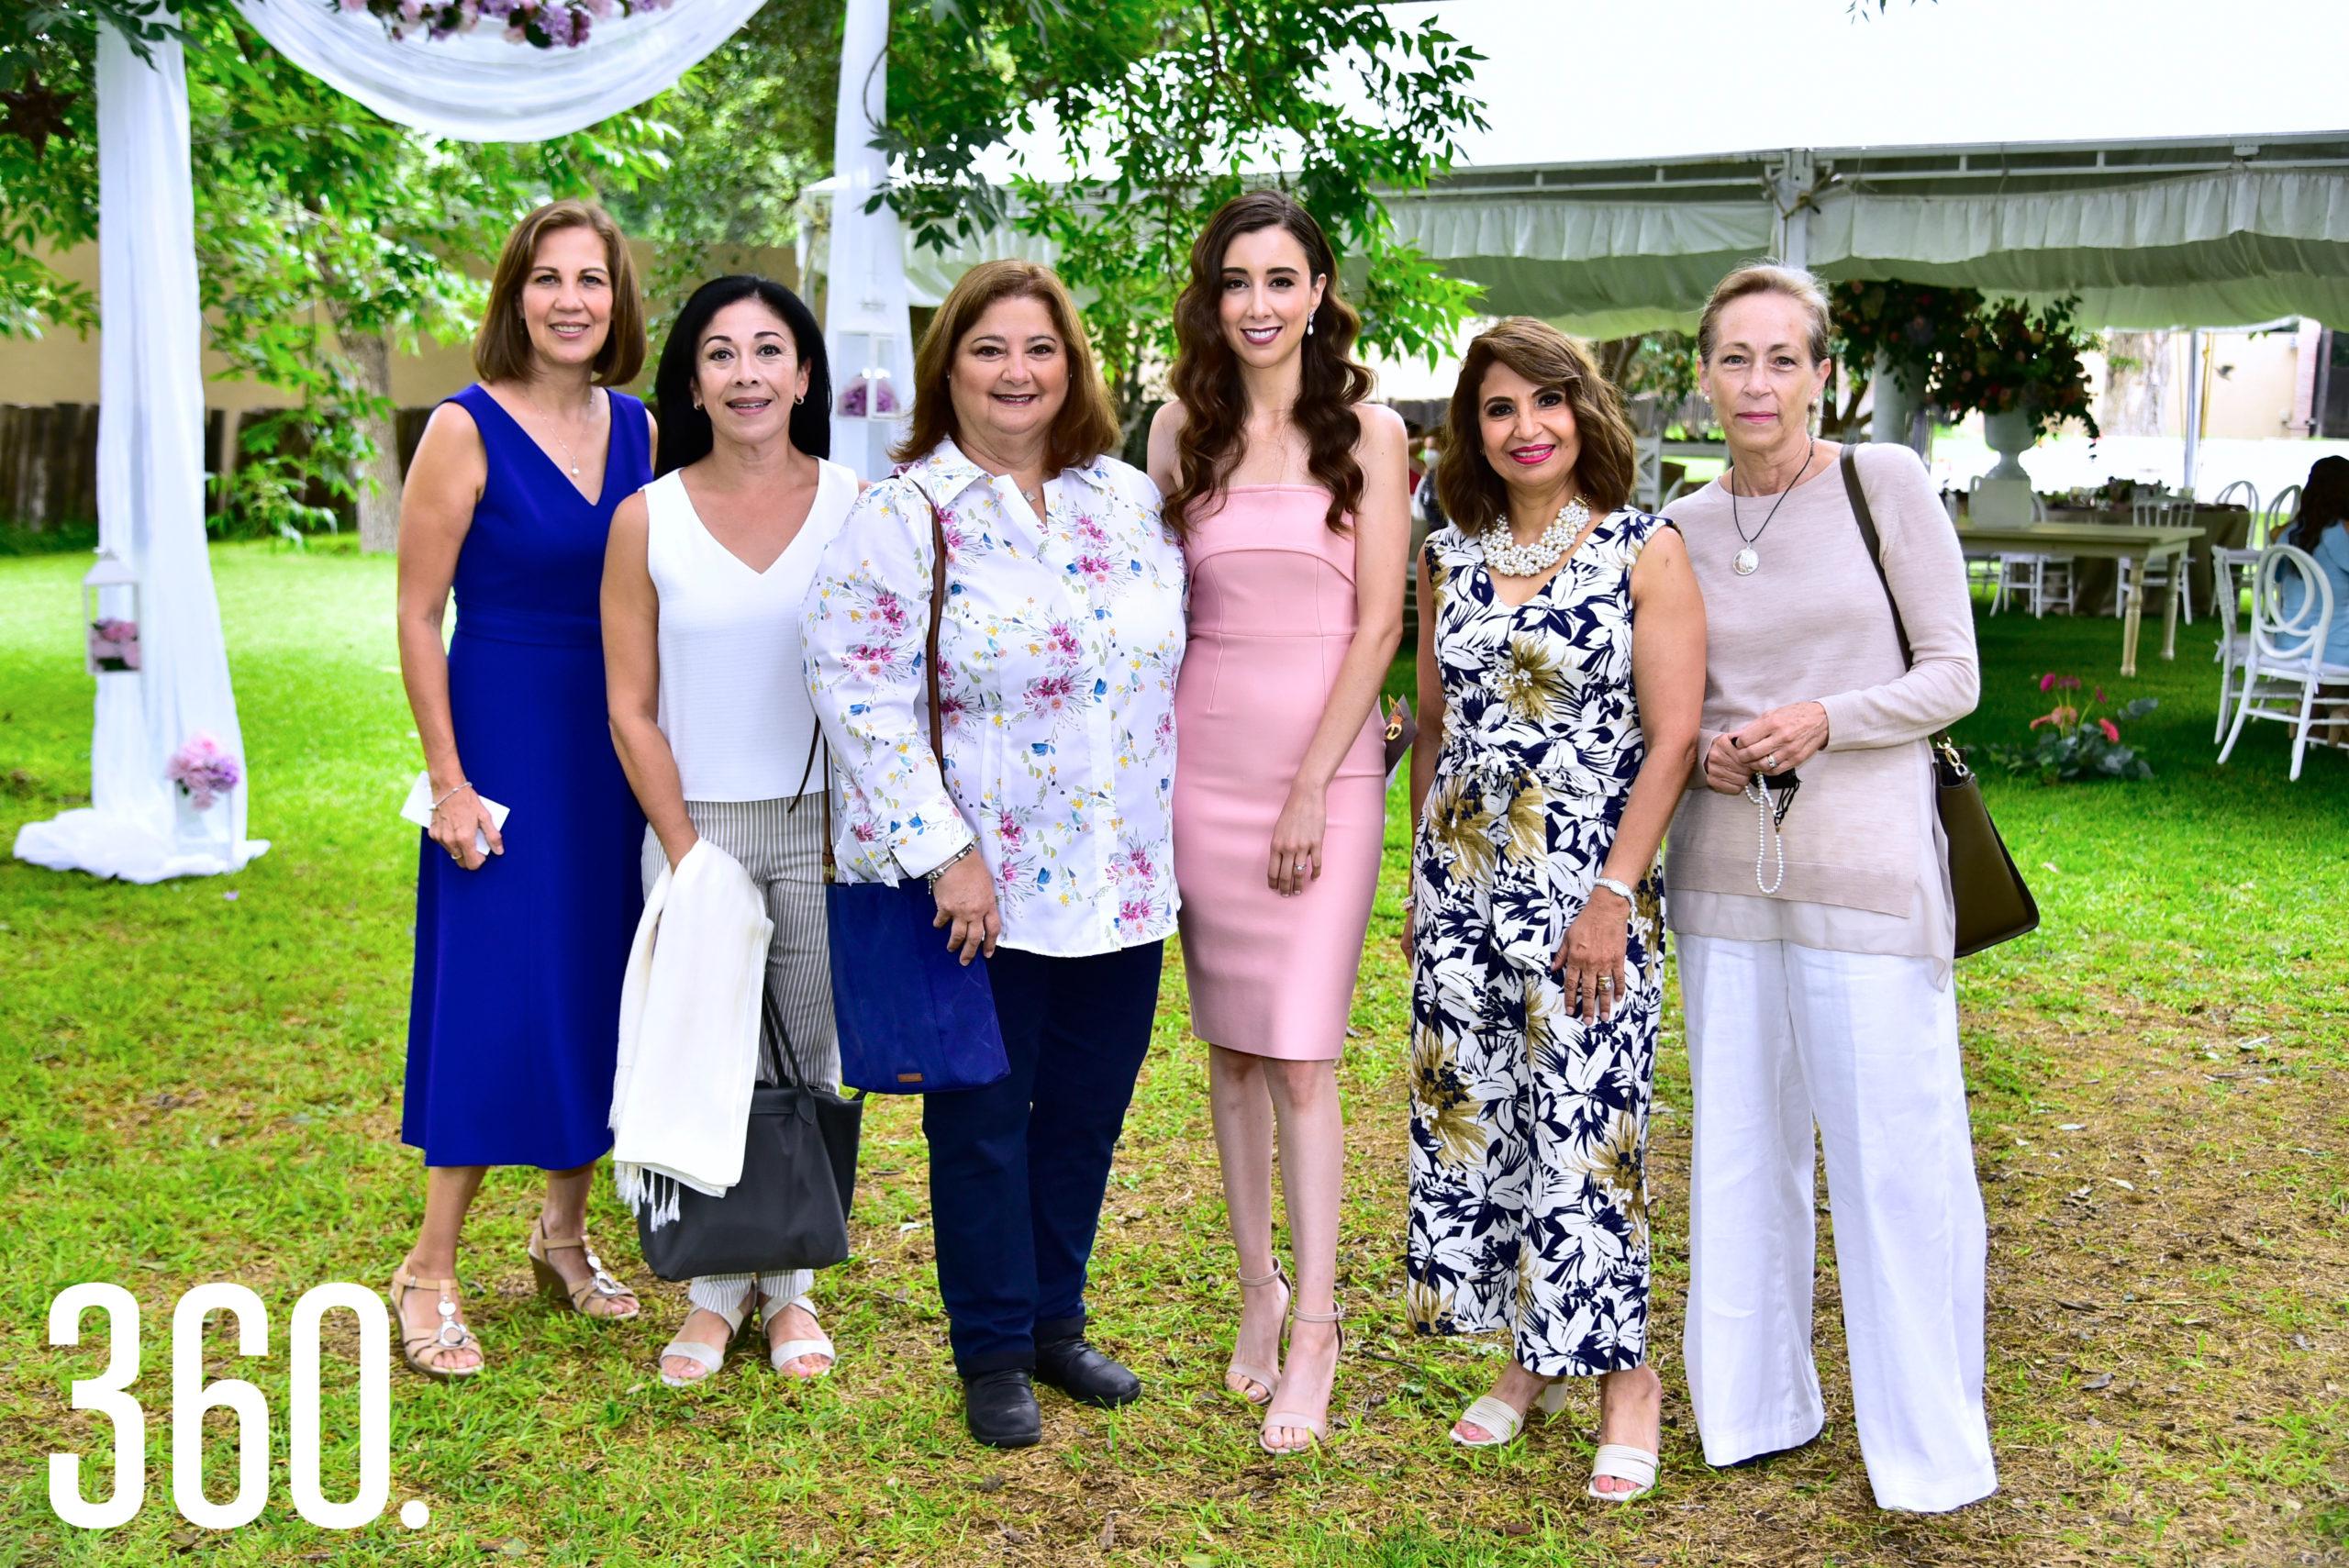 Magdalena Arsuaga, Virginia Reyes, Viviana Sada, Sofía Elguezabal, Martha Mireya Munguía y Celina Latapi.